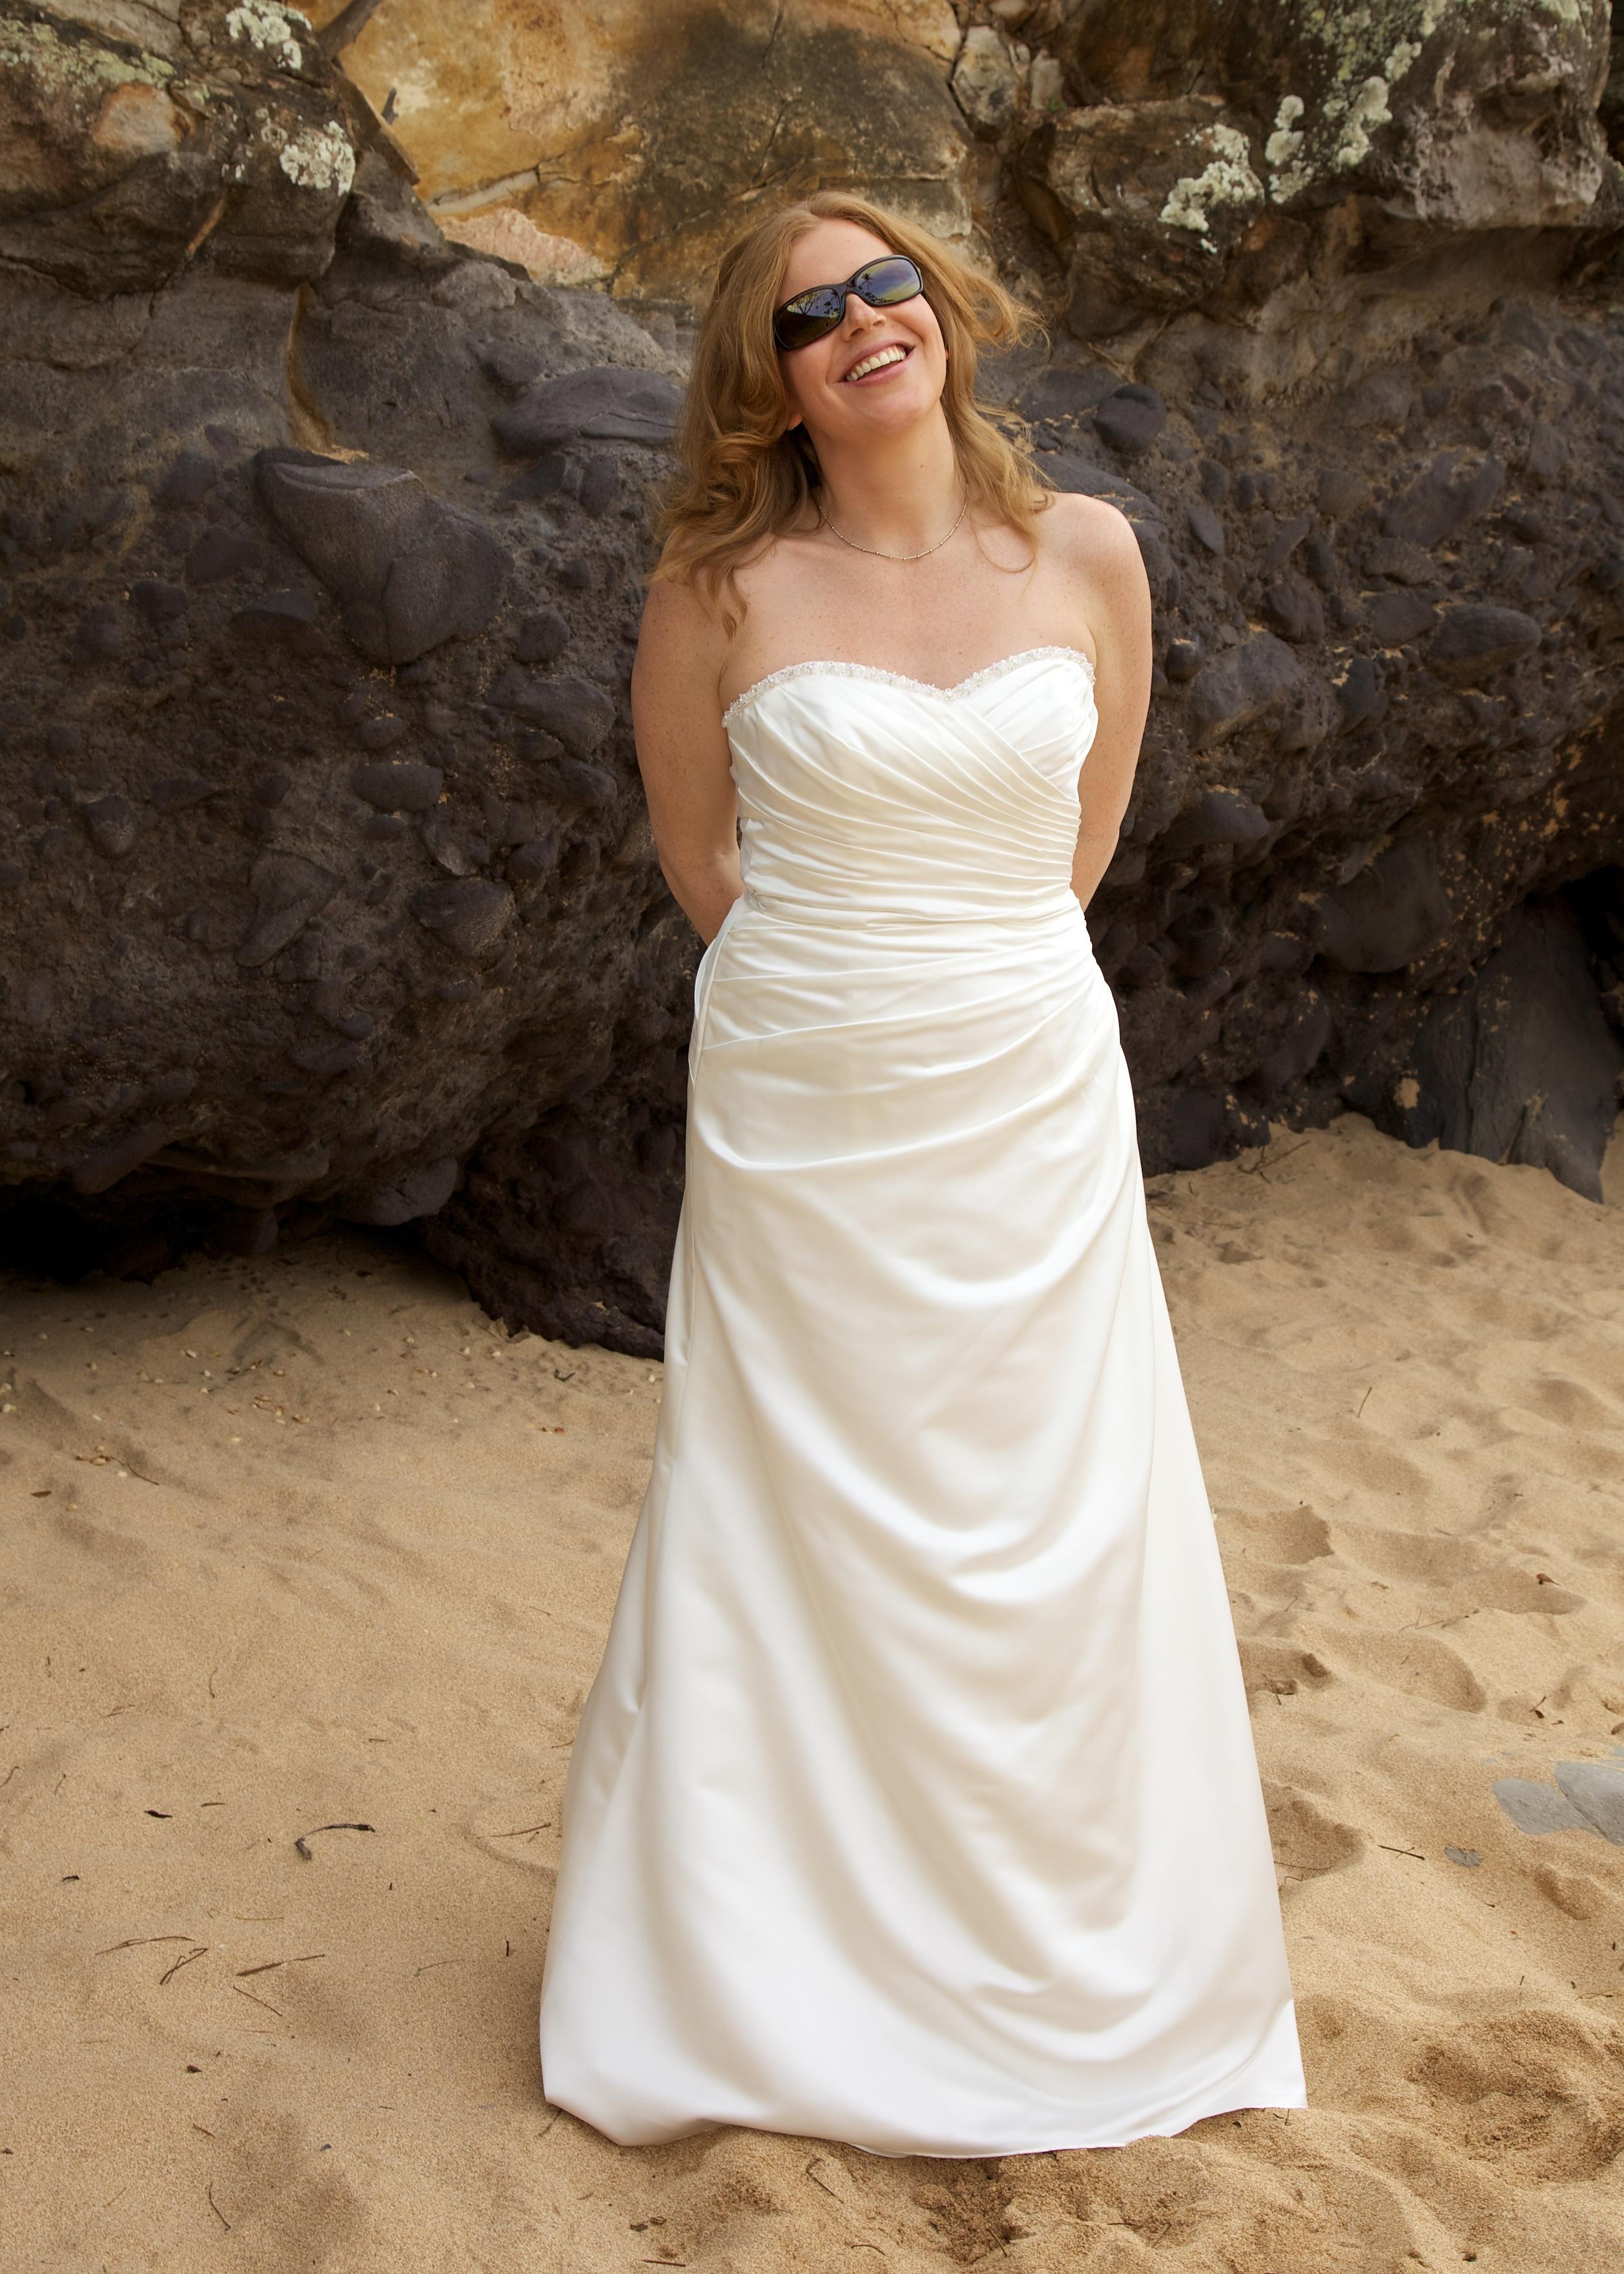 Wedding++28020+%2816+of+50%29-1766399955-O.jpg